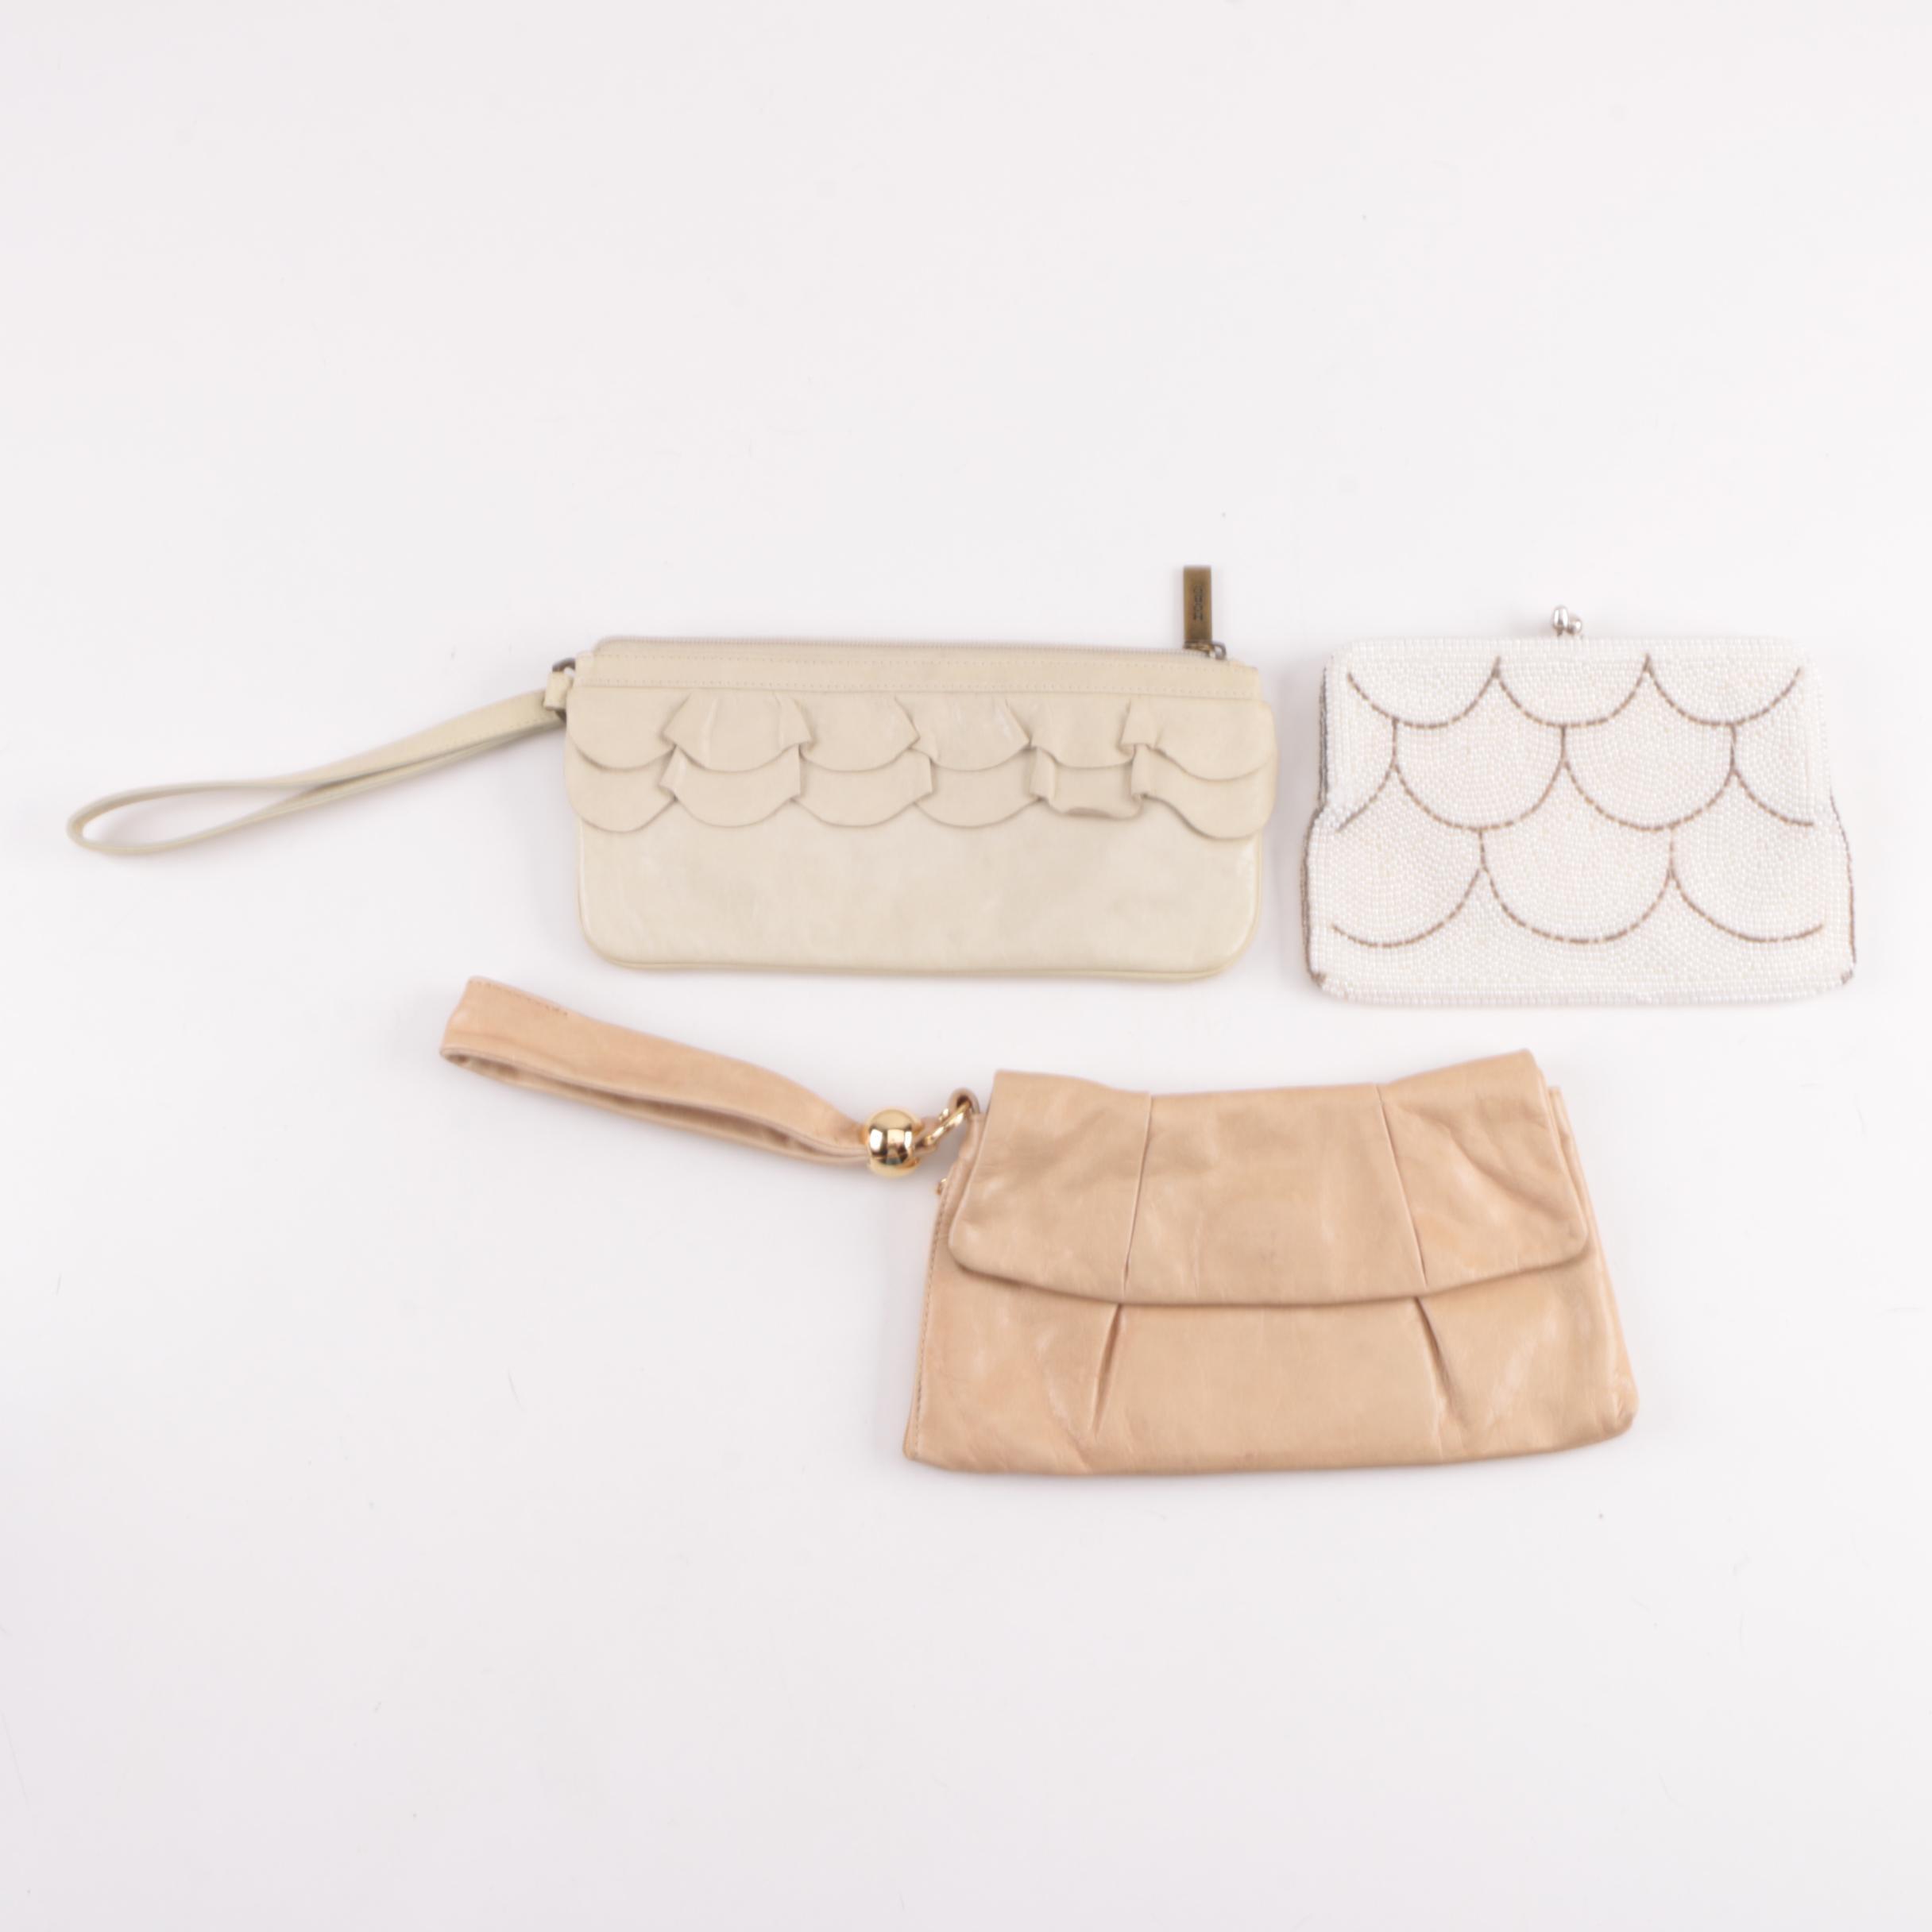 Hobo International Leather Wristlets and Vintage Beaded Frame Bag